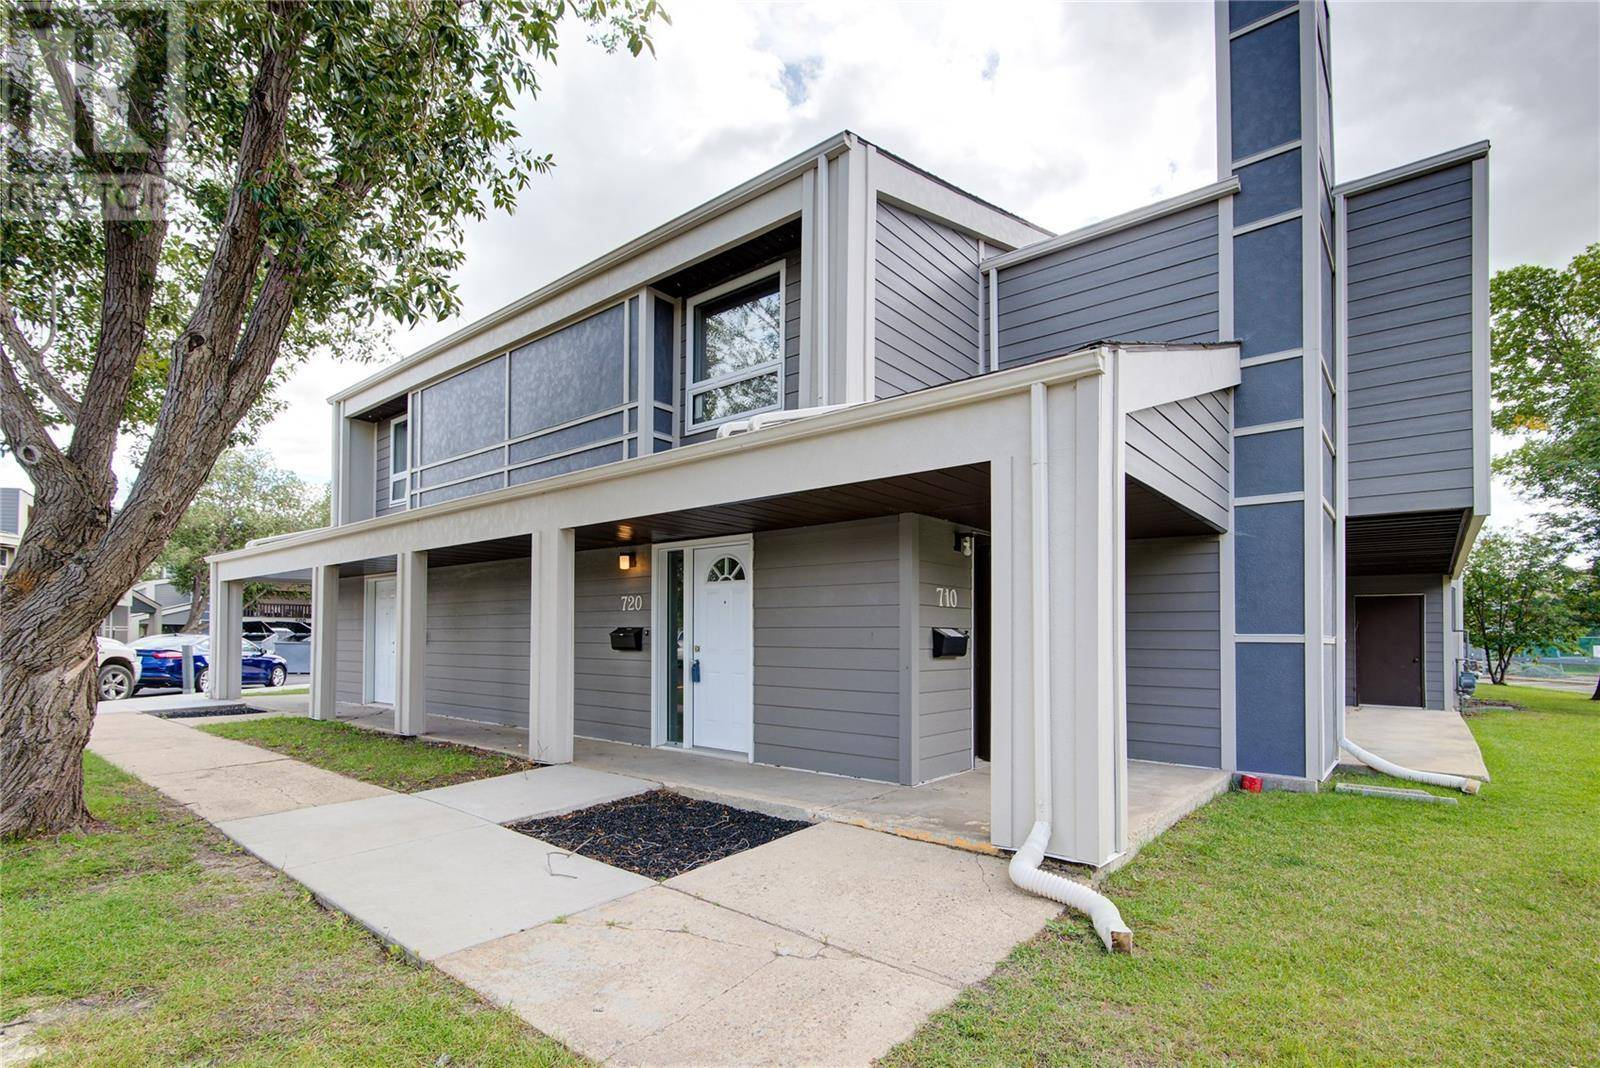 Condo for sale at 425 115th St E Unit 720 Saskatoon Saskatchewan - MLS: SK785062